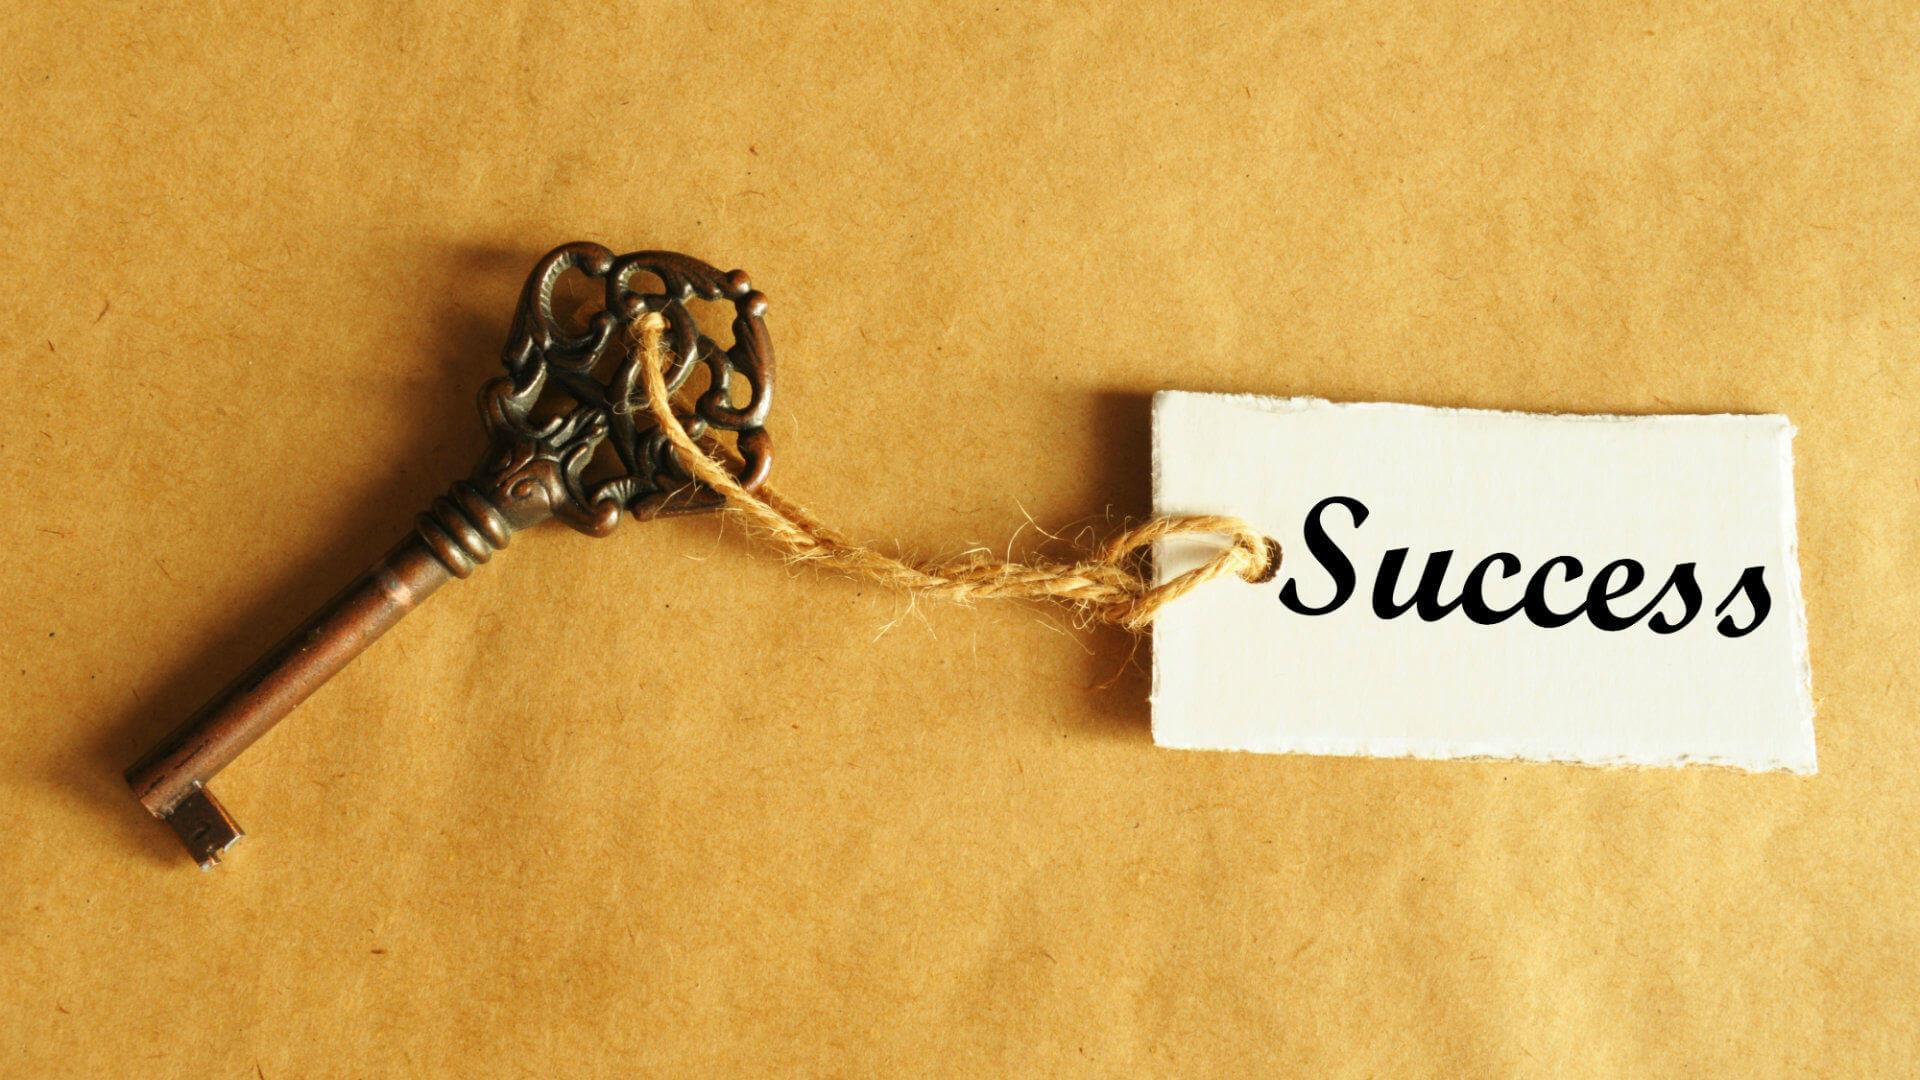 key-success-unlock-ss-1920.jpg (329.41 Kb)